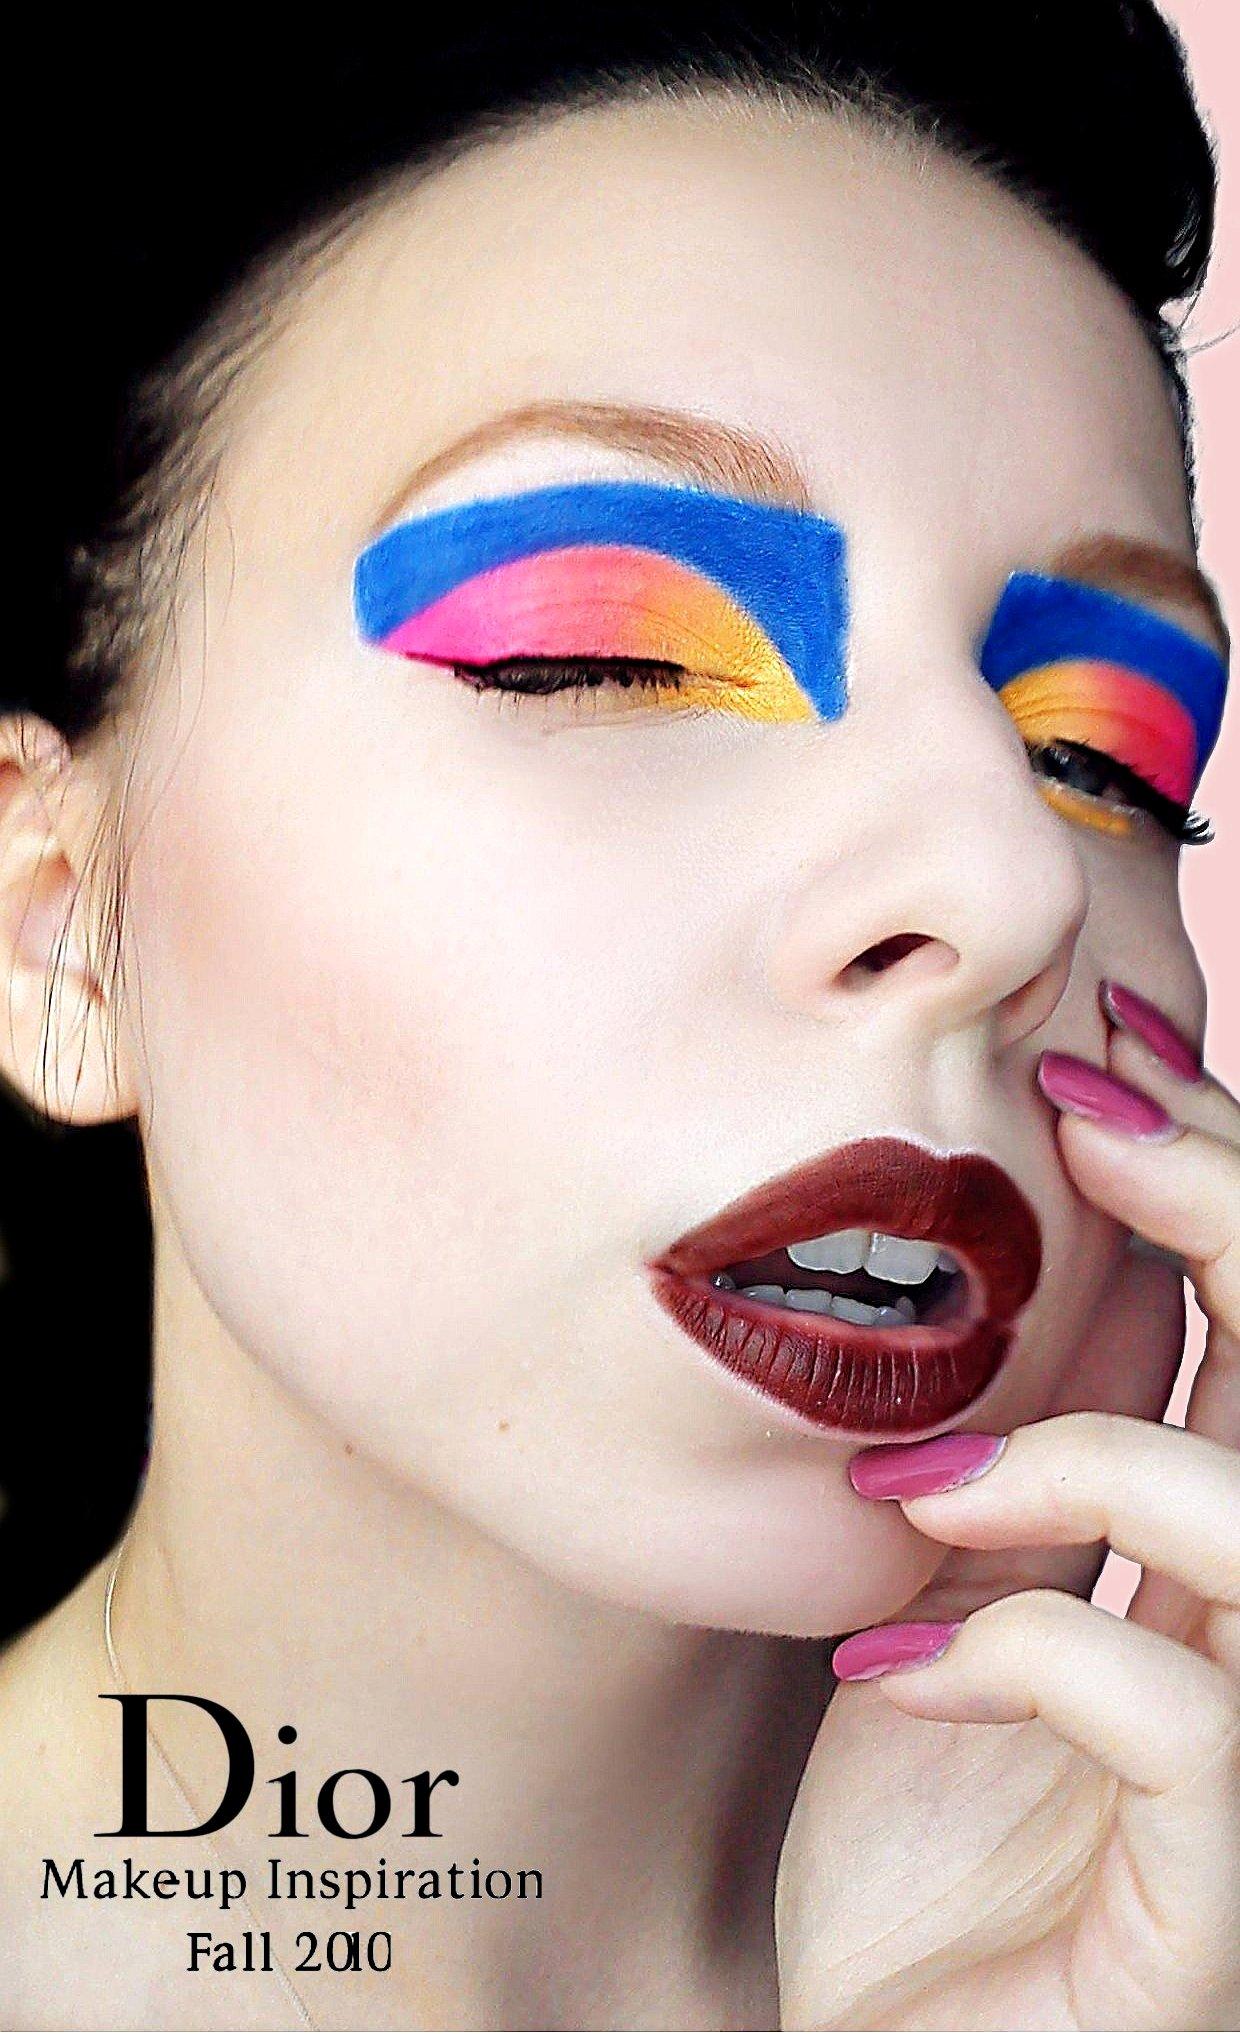 Dior Haute Couture Makeup Inspiration